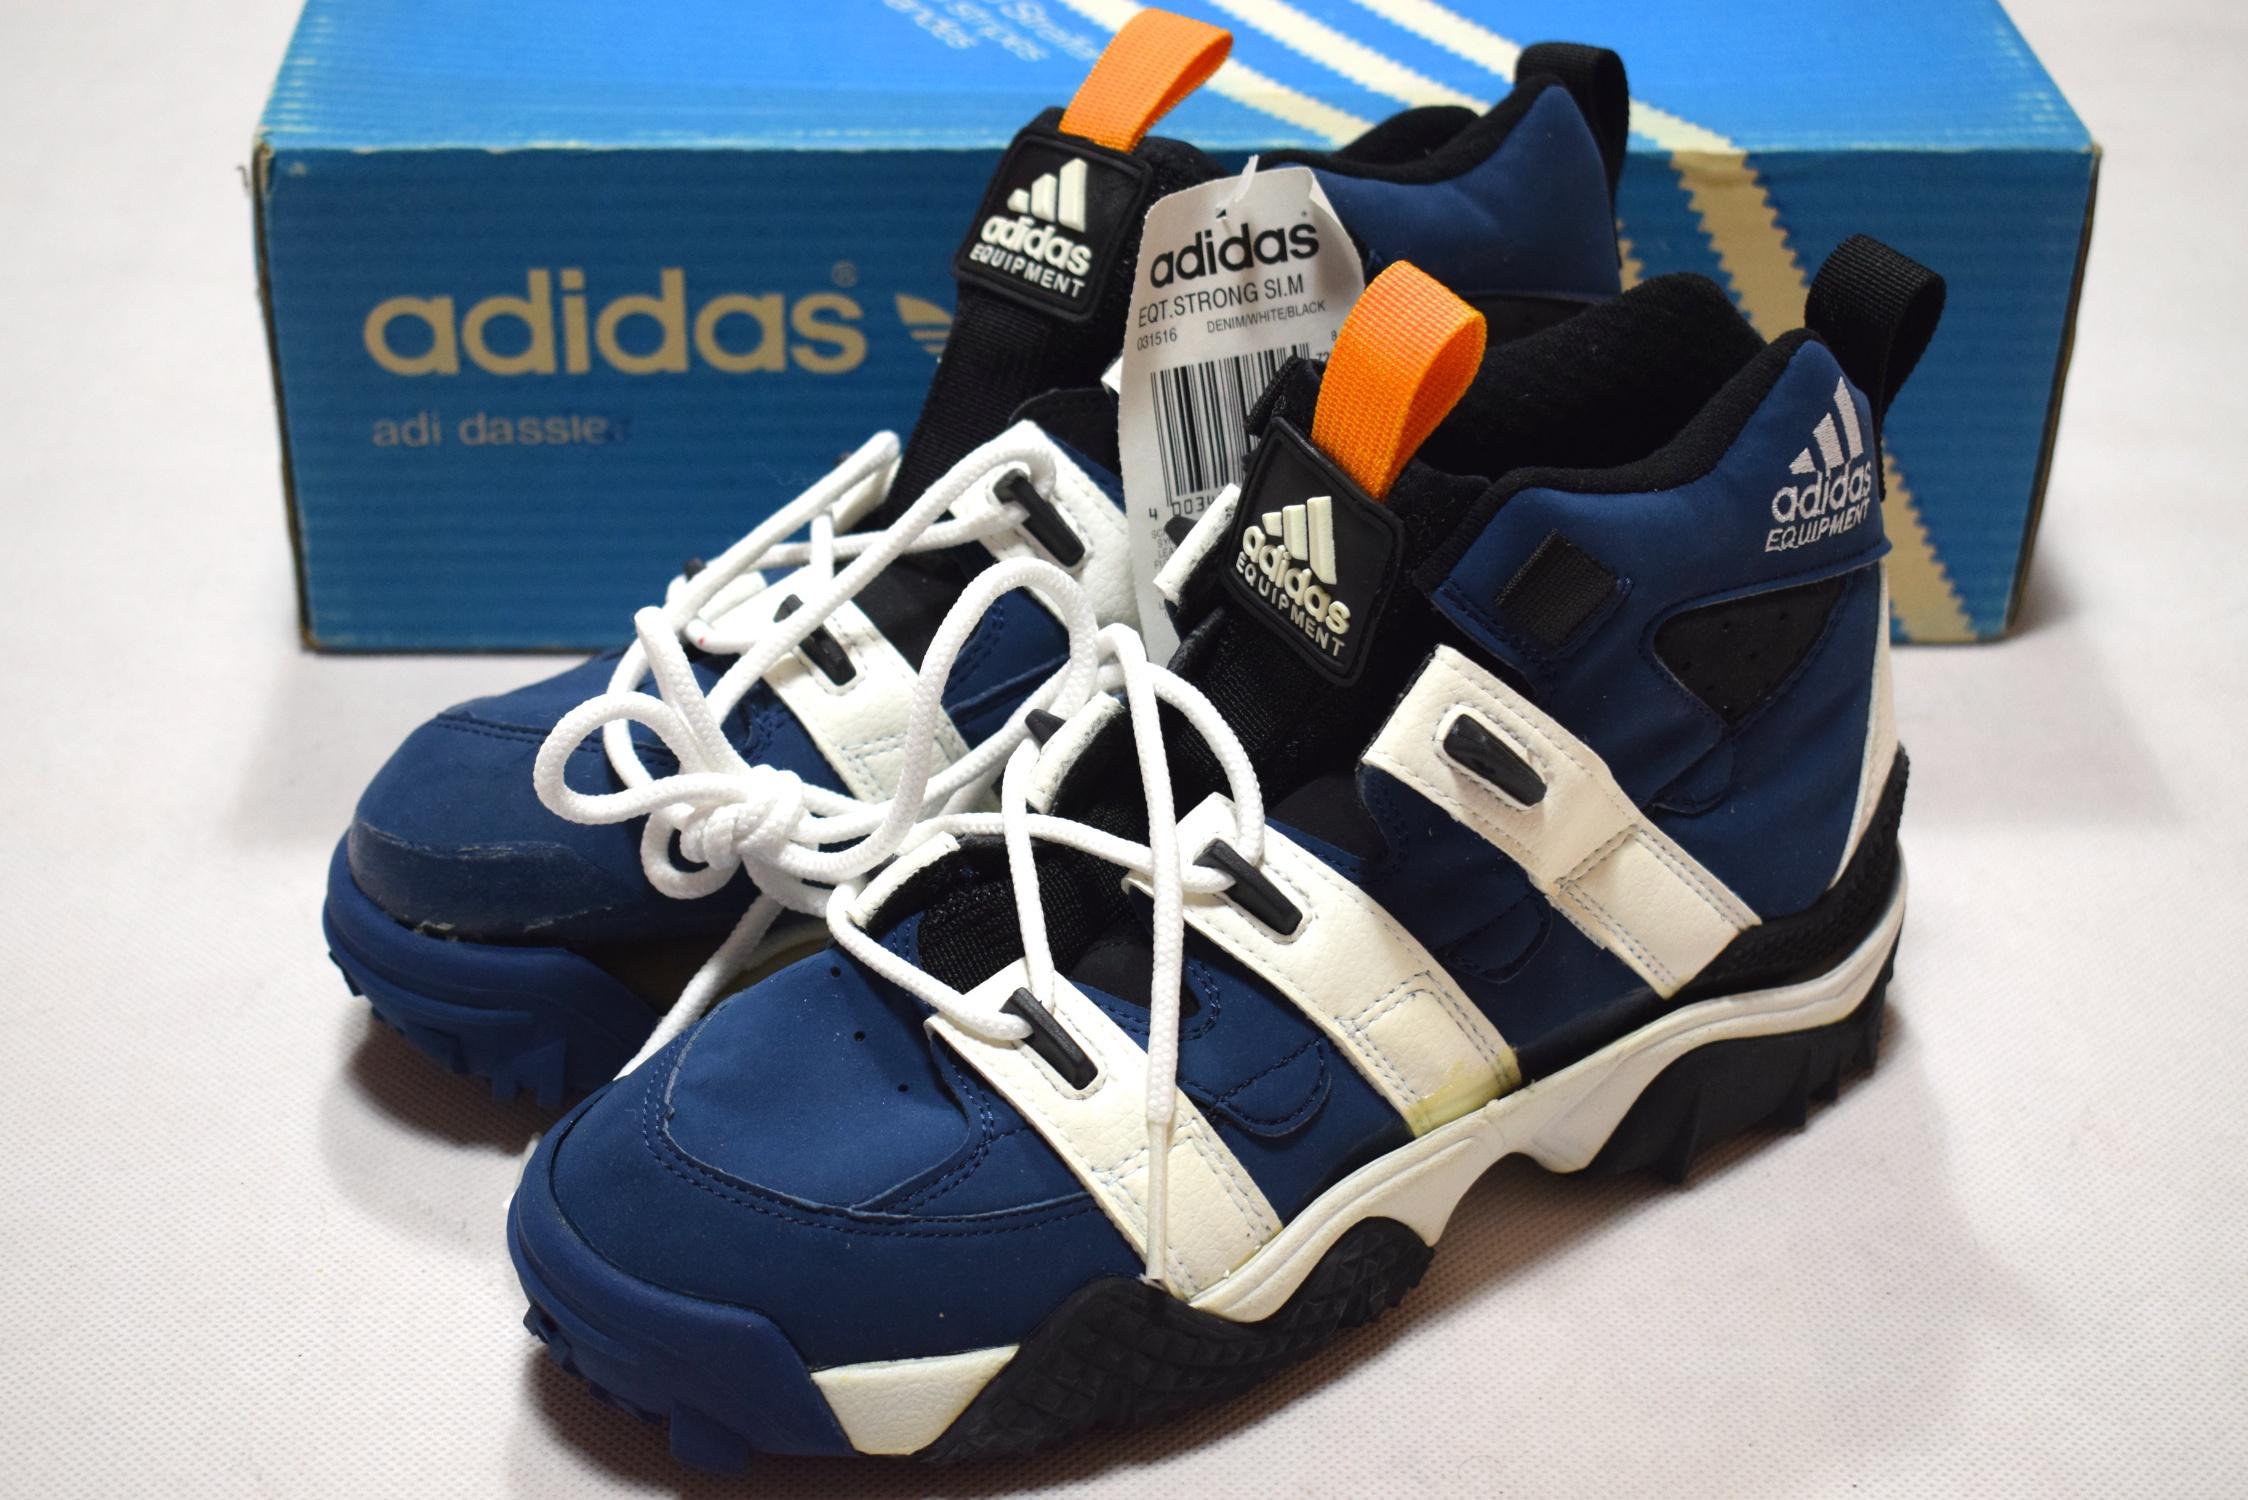 90s Sneaker Deadstock Mutombo Schuhe Vintage Sport Adidas Trainers n0N8mwvO